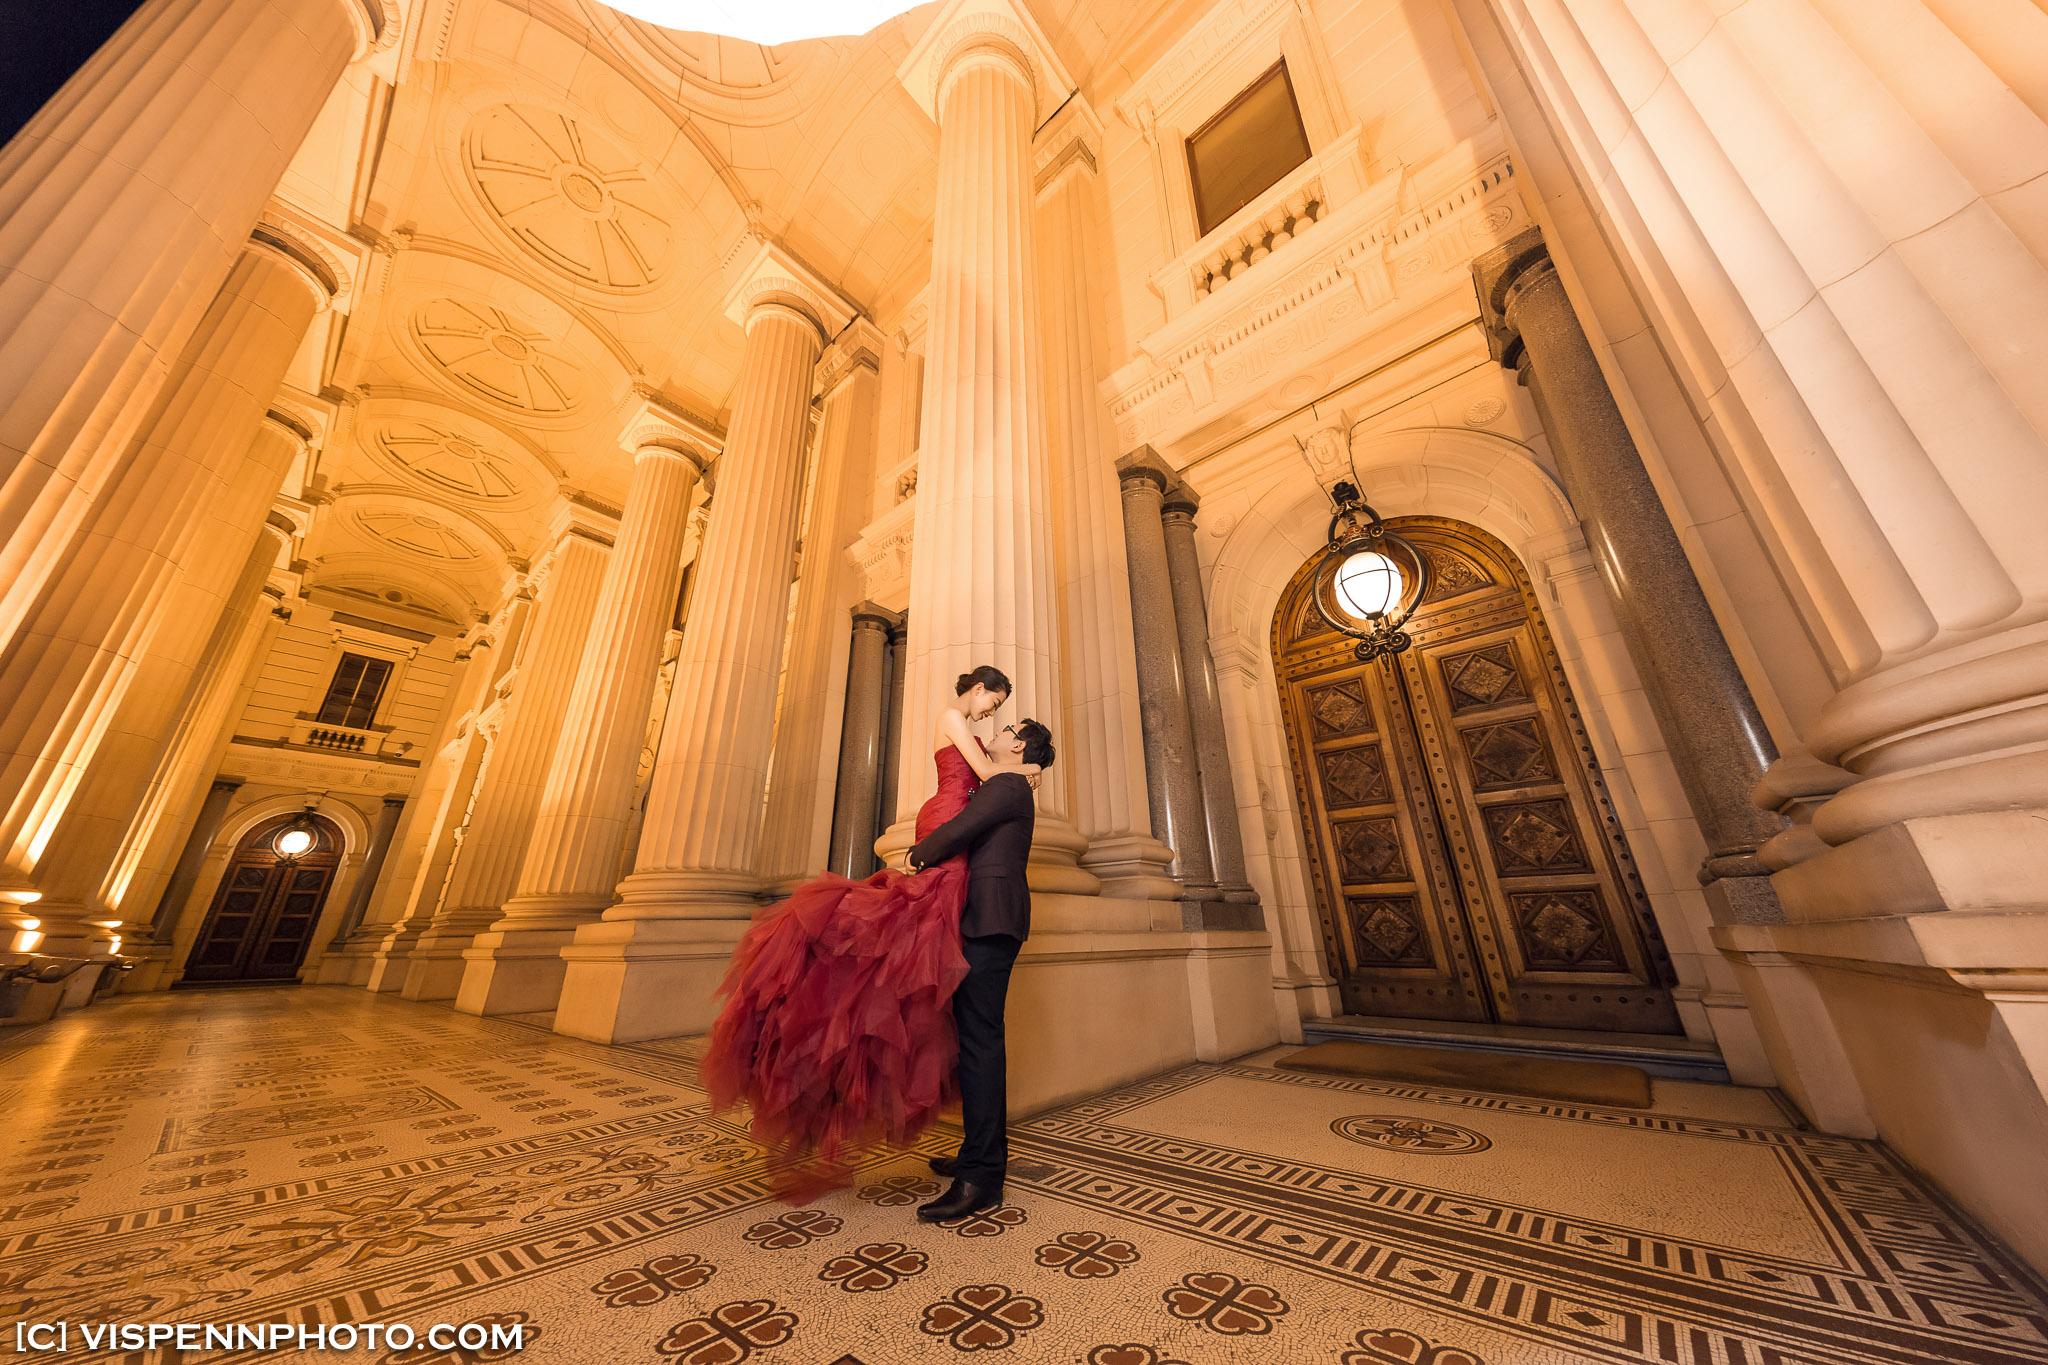 PRE WEDDING Photography Melbourne VISPENN 墨尔本 婚纱照 结婚照 婚纱摄影 VISPENN YZWangPreWedding 3115